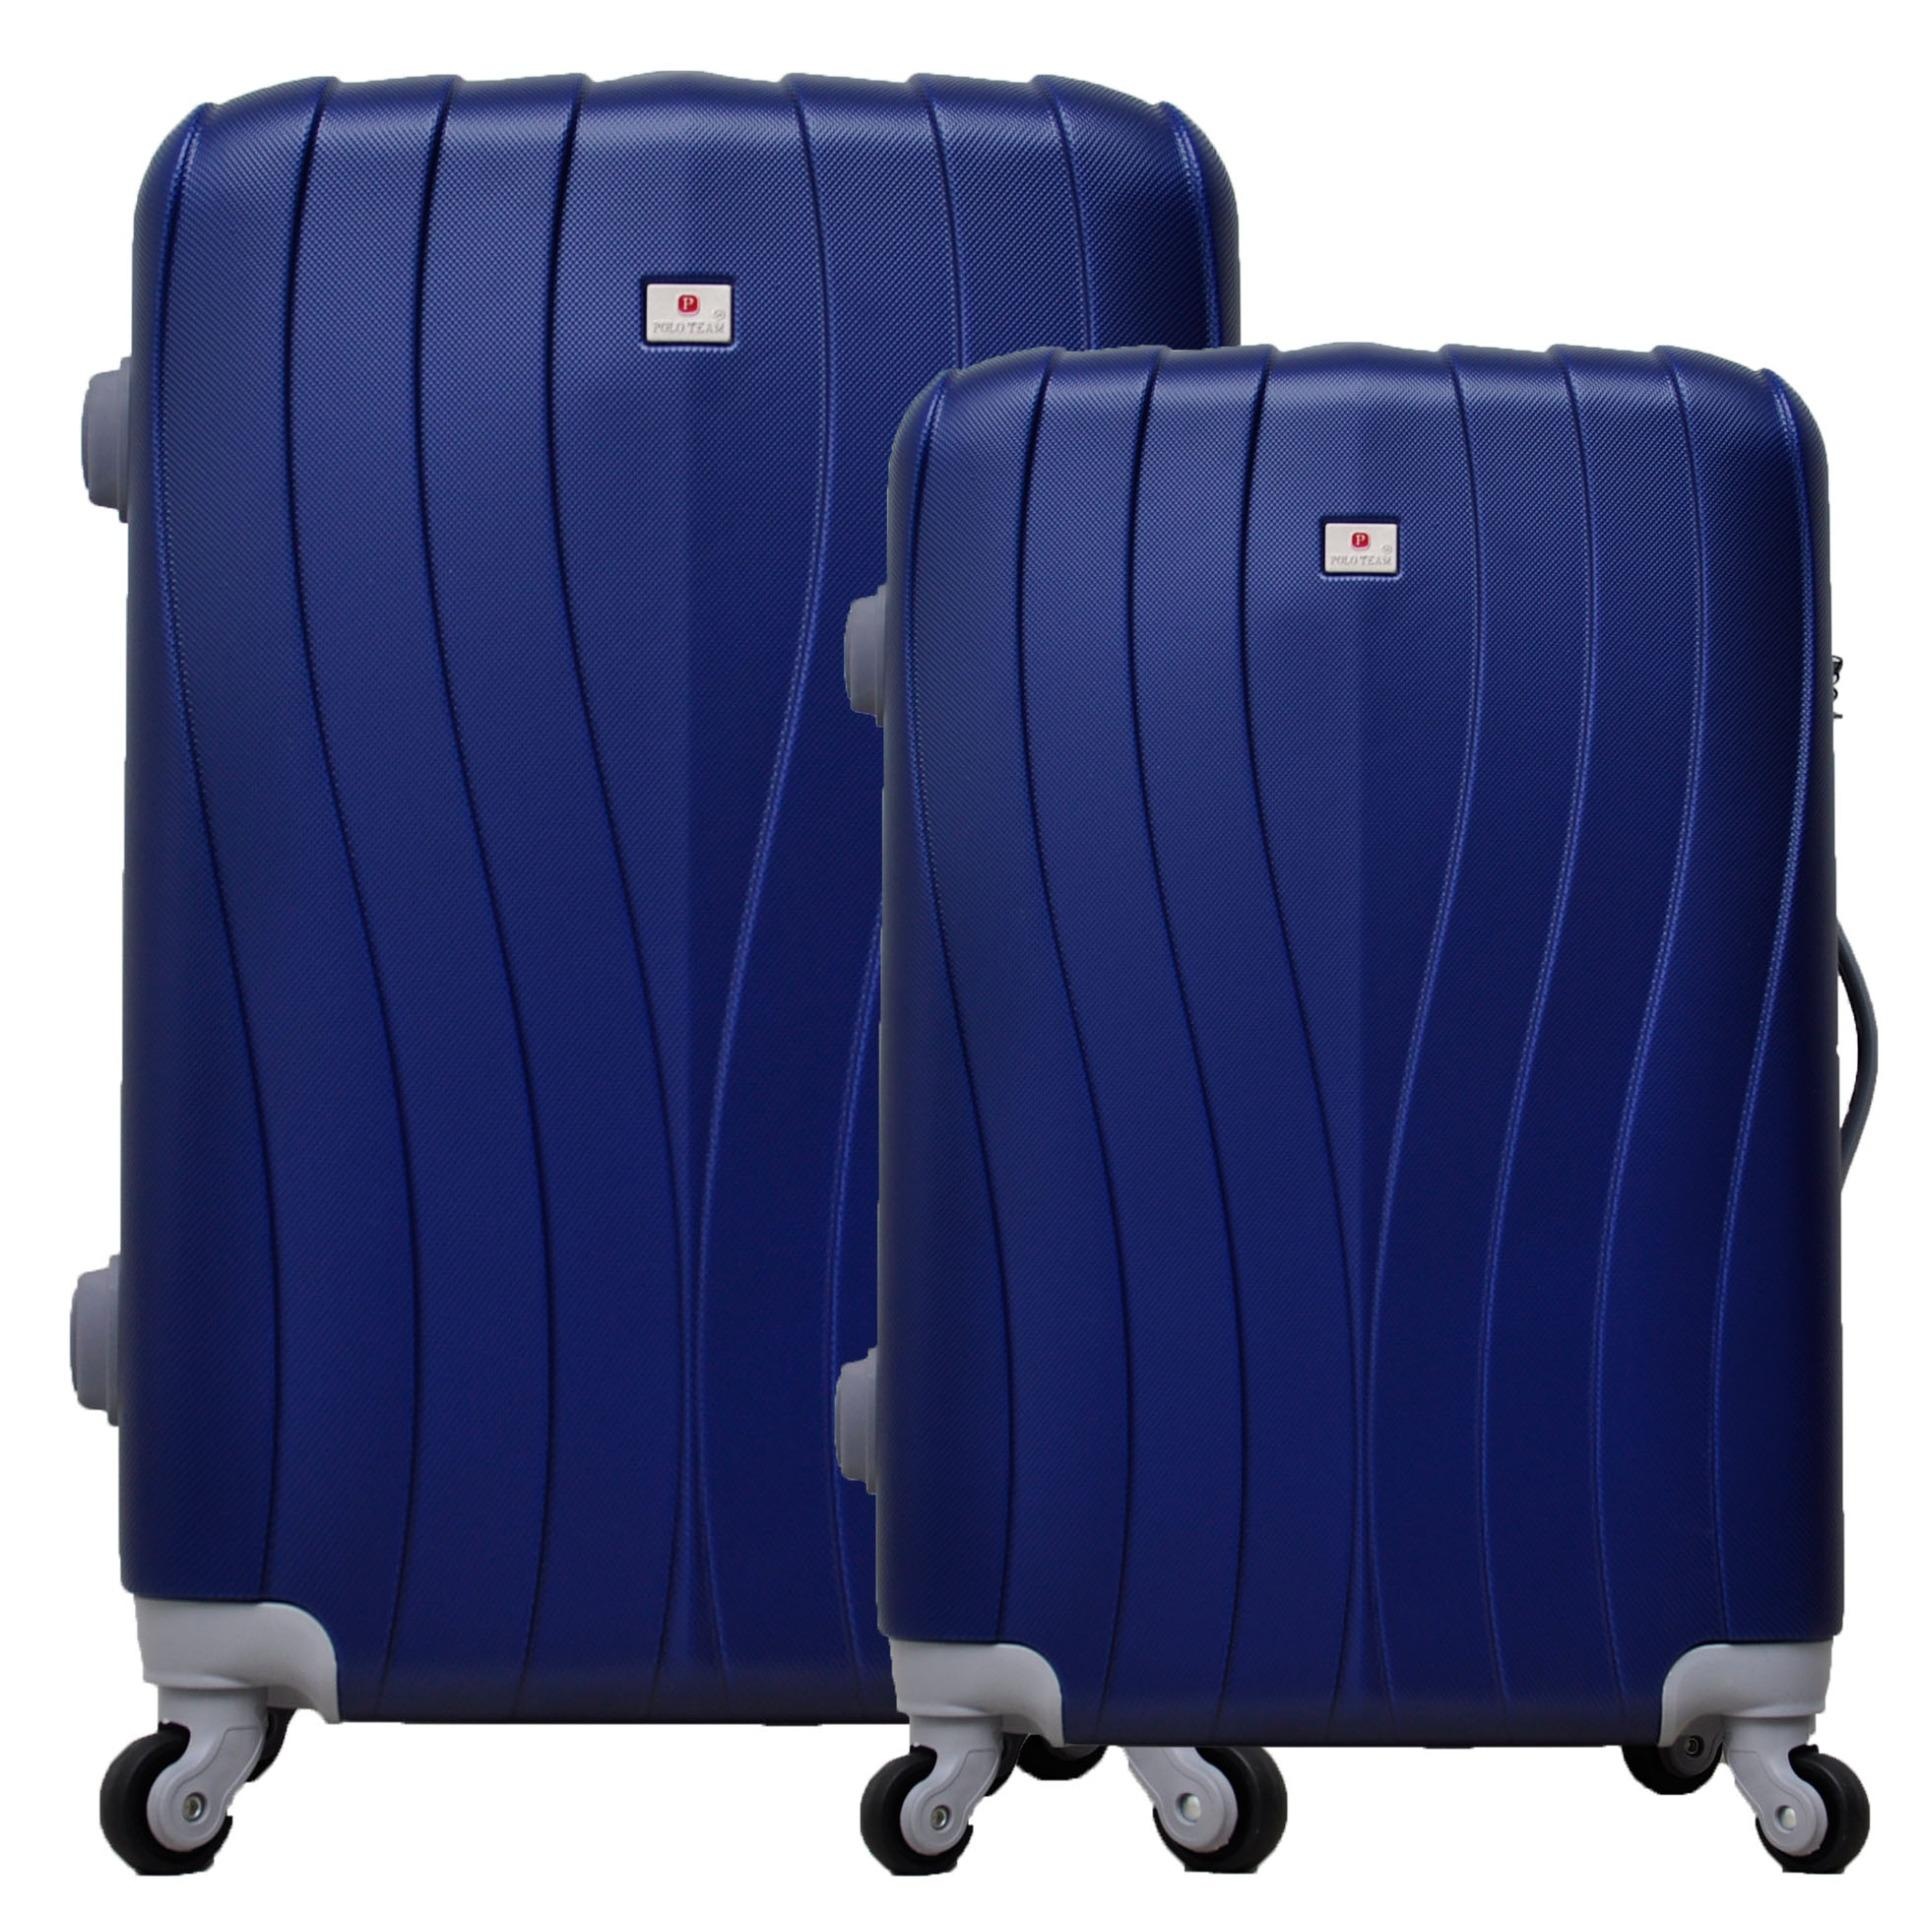 Jual Polo Team Tas Koper Hardcase Set Size 19 23 Inch 002 Biru Tua Branded Original